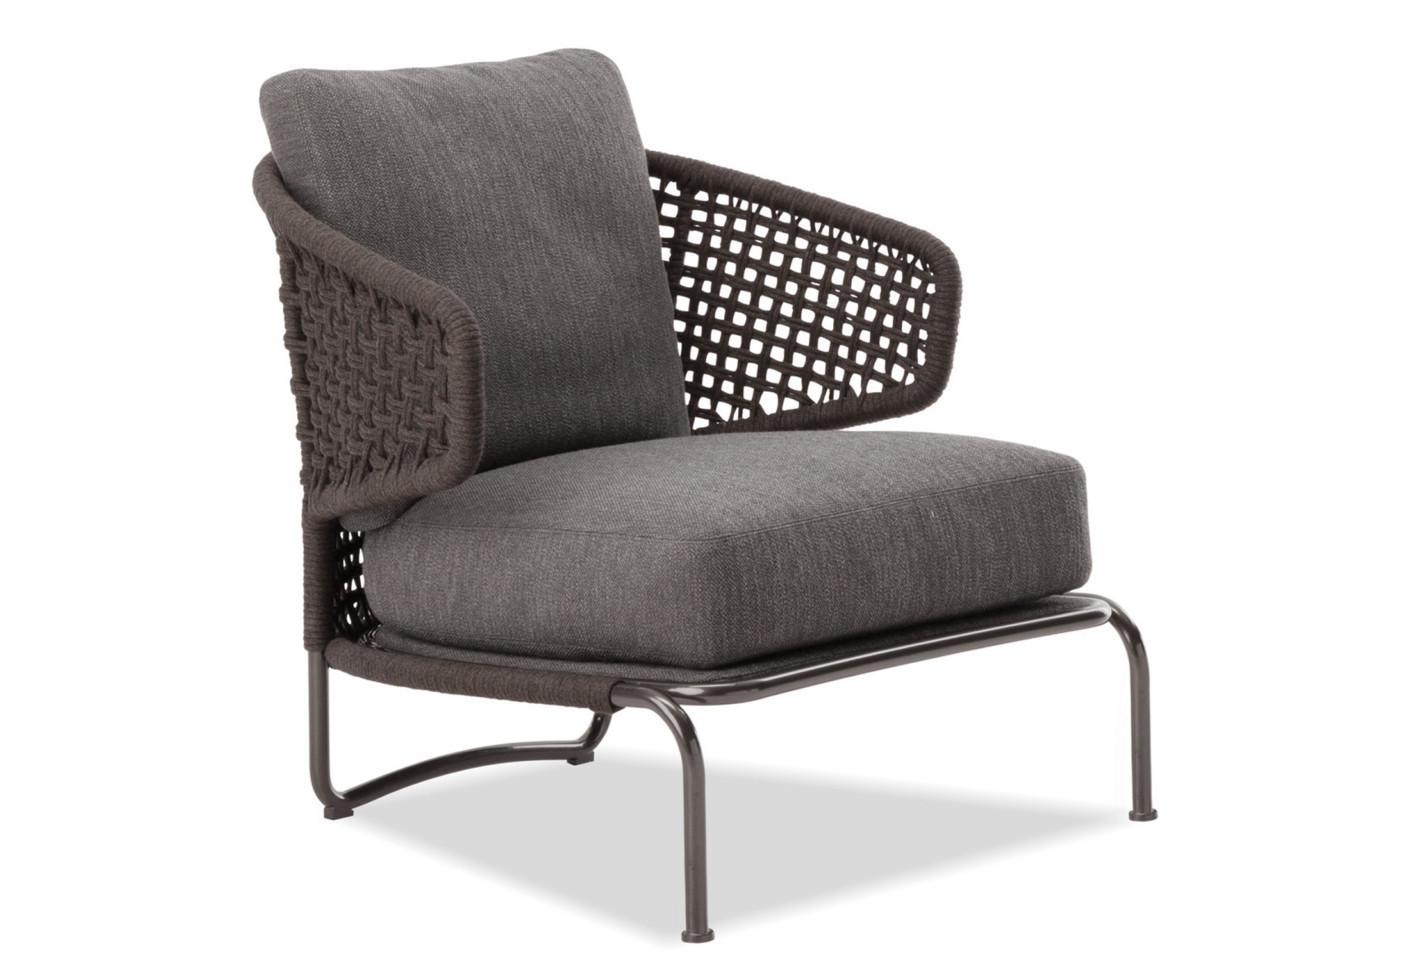 aston cord sessel mit armlehne von minotti stylepark. Black Bedroom Furniture Sets. Home Design Ideas